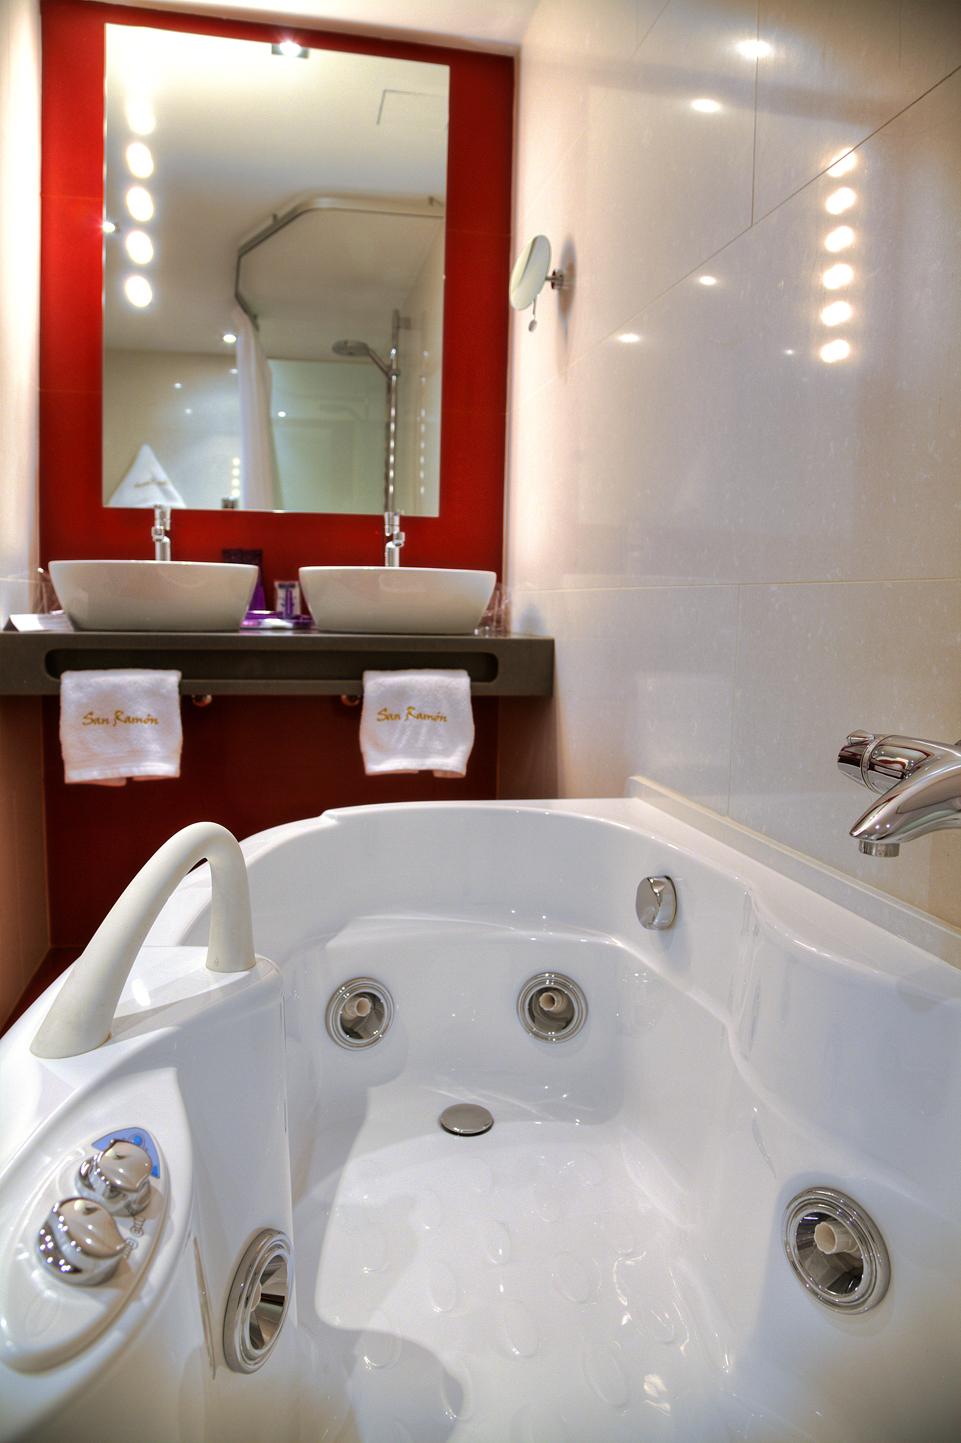 Detalle de los chorros de agua a presión de bañera hidromasaje habitación Doble Superior